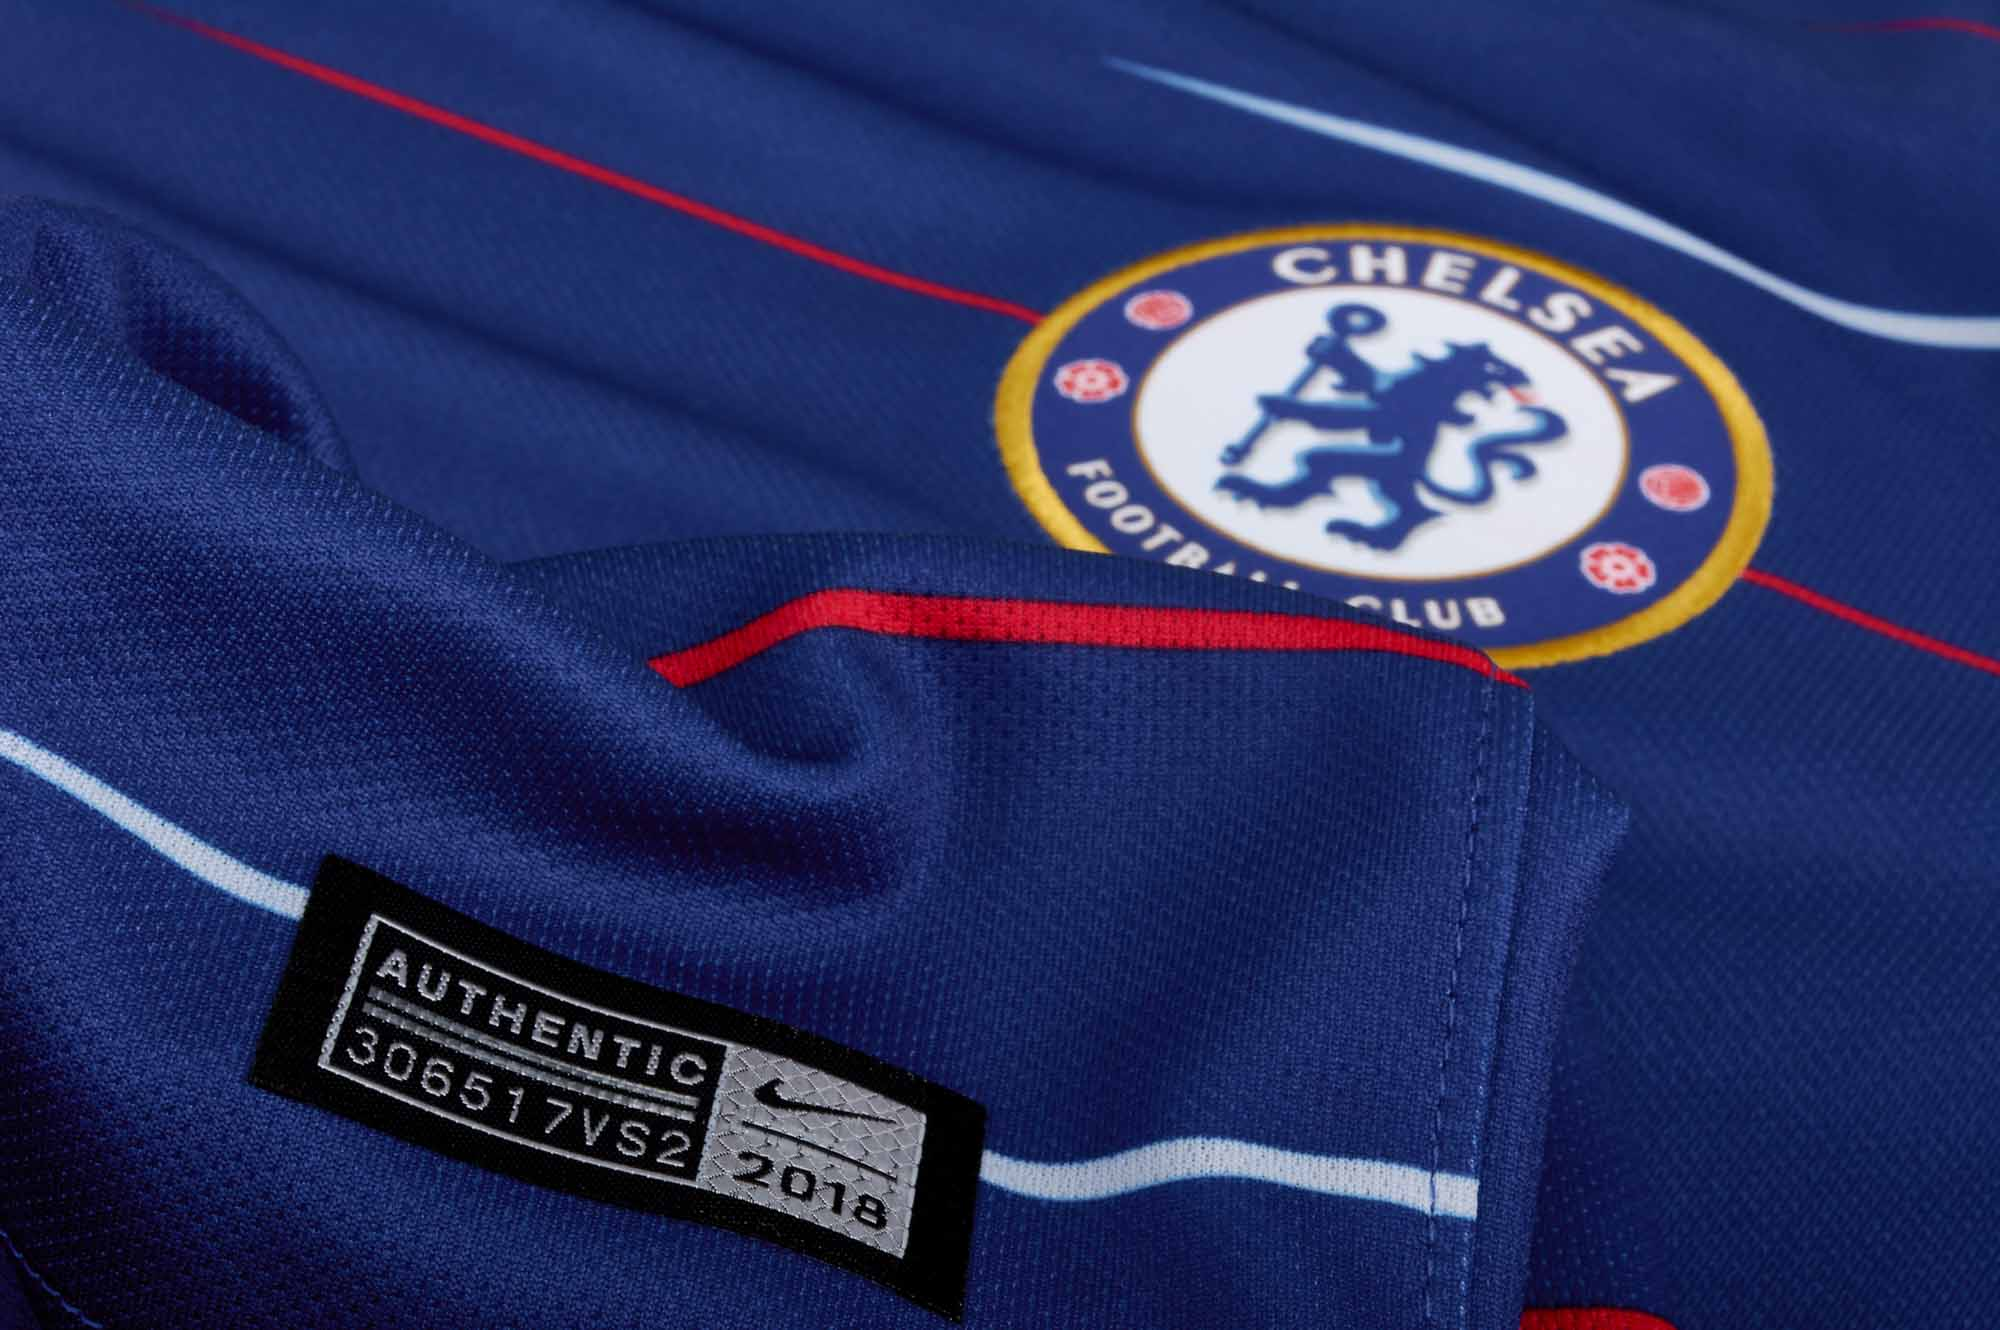 ae4b0e265fb Jerseys On Sale Kids Manchester United Away Whole Kit Soccer Jersey ...